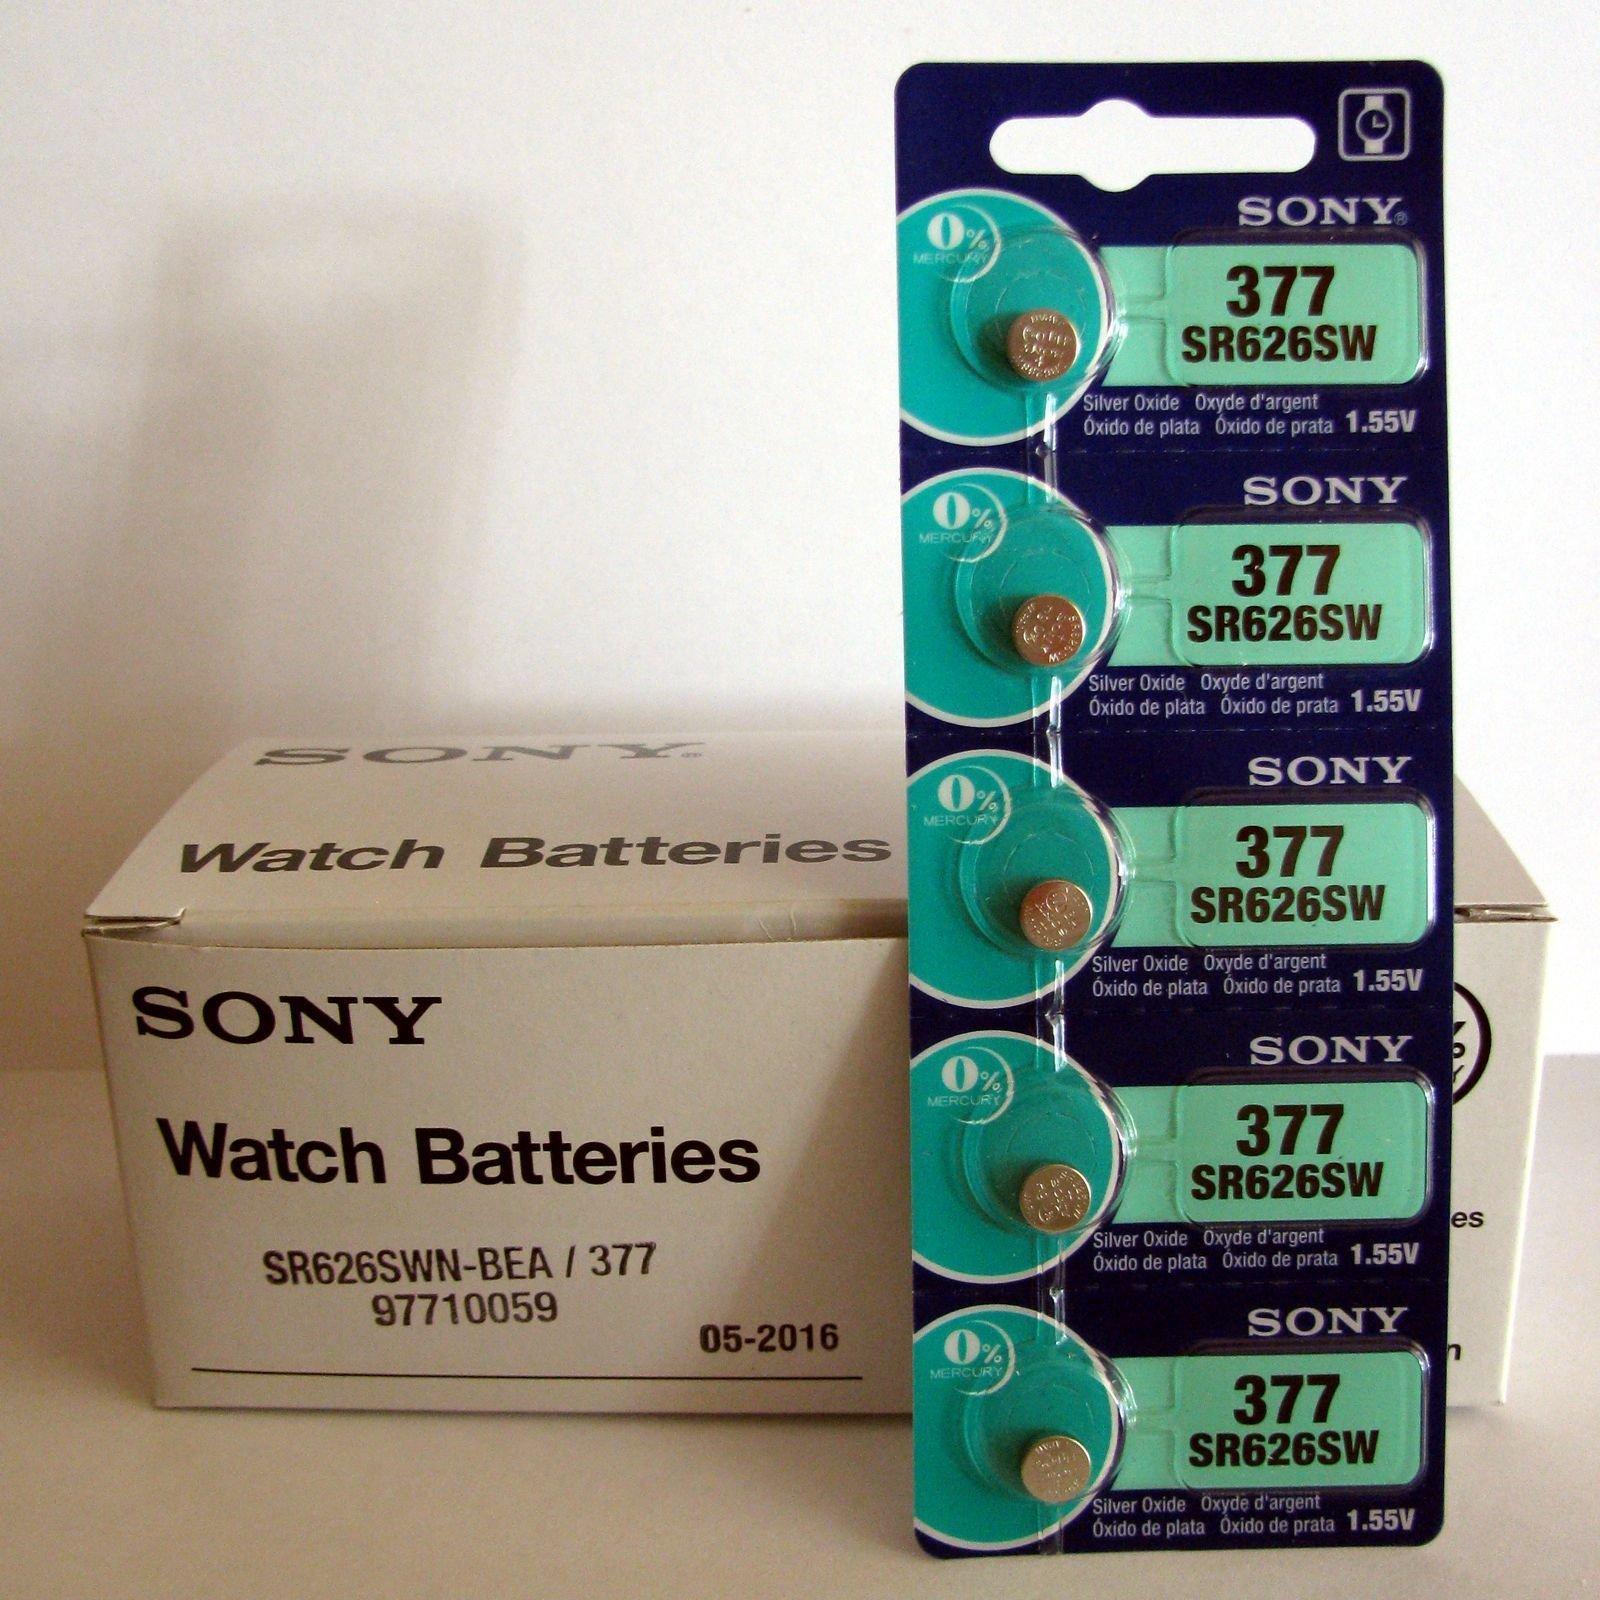 Sony Battery 377 (SR626SW) Silver Oxide 1.55V (100 Batteries Per Box) by Sony